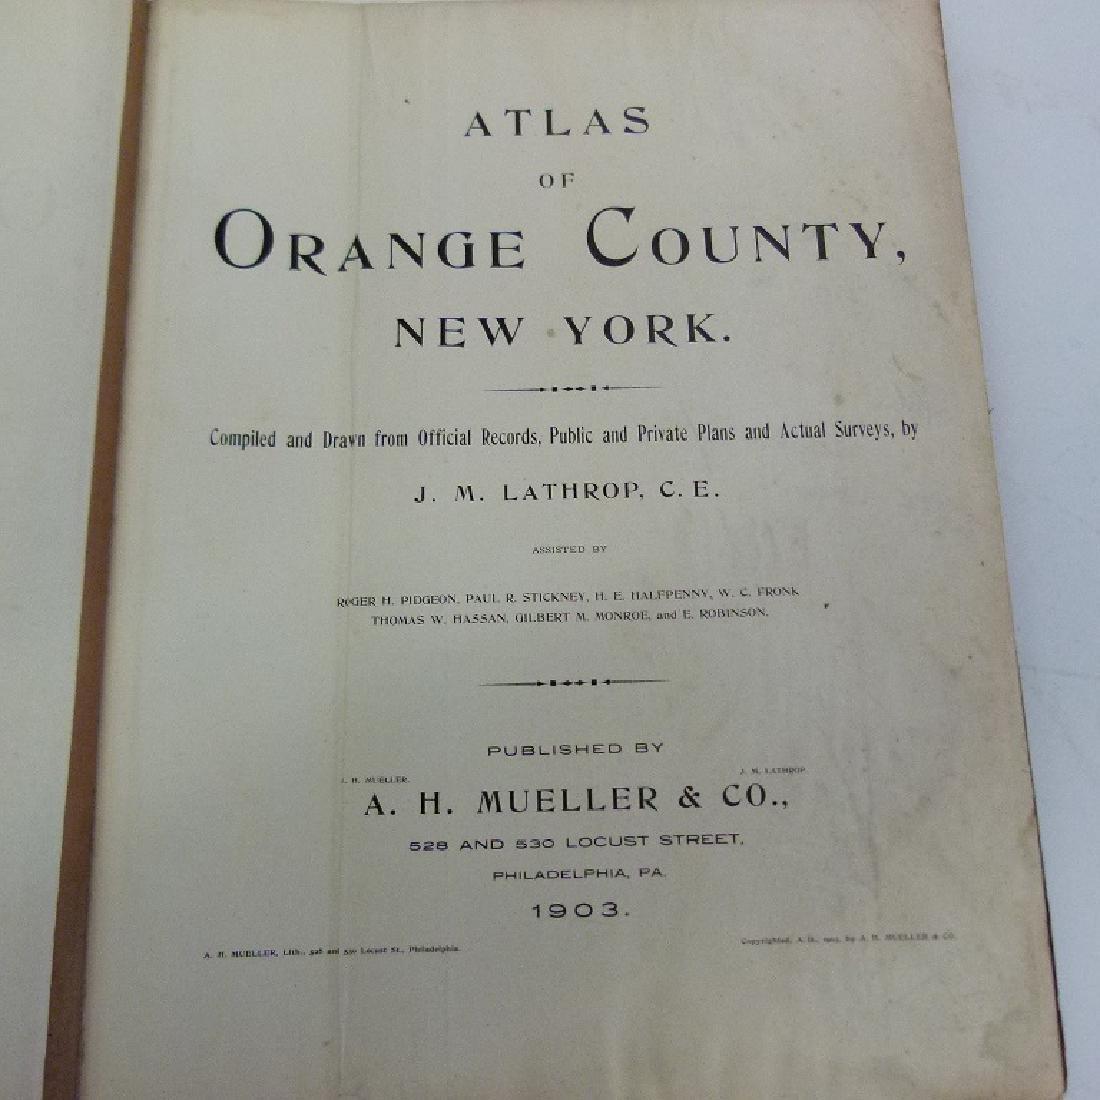 (2) ATLAS OF ORANGE COUNTY NY, A.H. MUELLER 1903 - 8